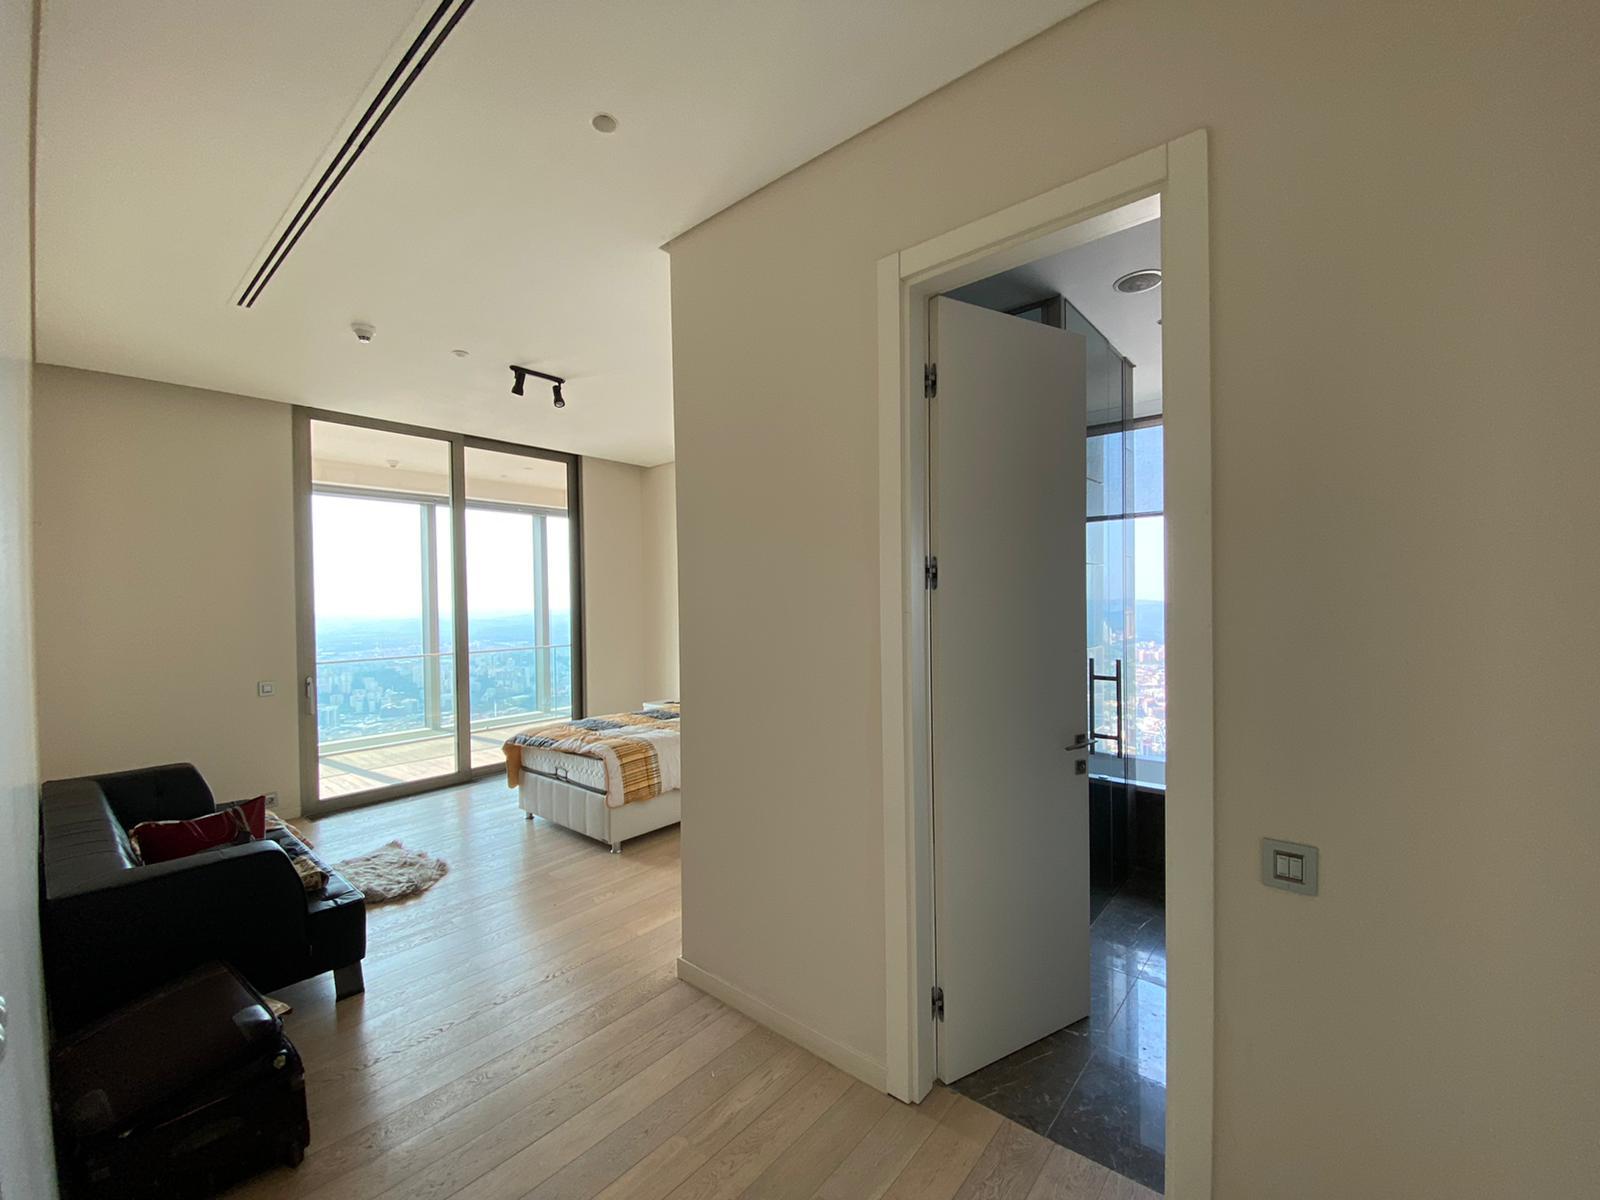 penthouse-istanbul-sapphire-tower-009-1.jpg